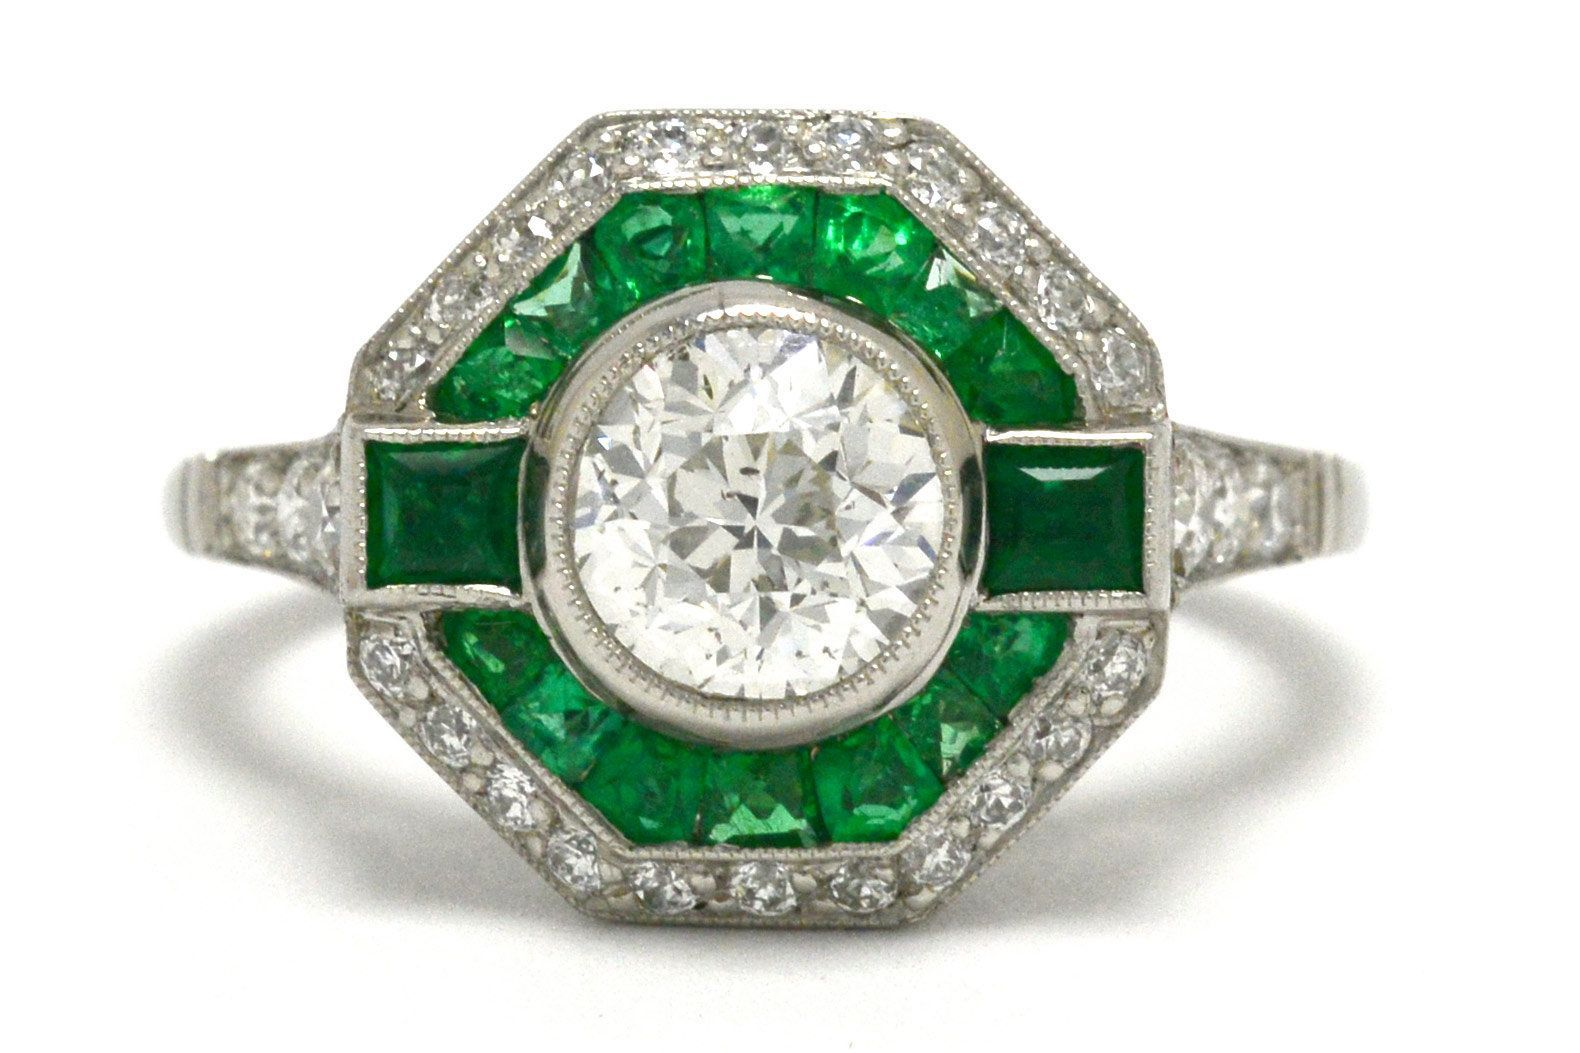 Dazzling Art Deco Transitional Round Diamond Emerald Halo Engagement Ring Geometric Octagon Platinum Vintage Cocktail Ring Statement Jewelry